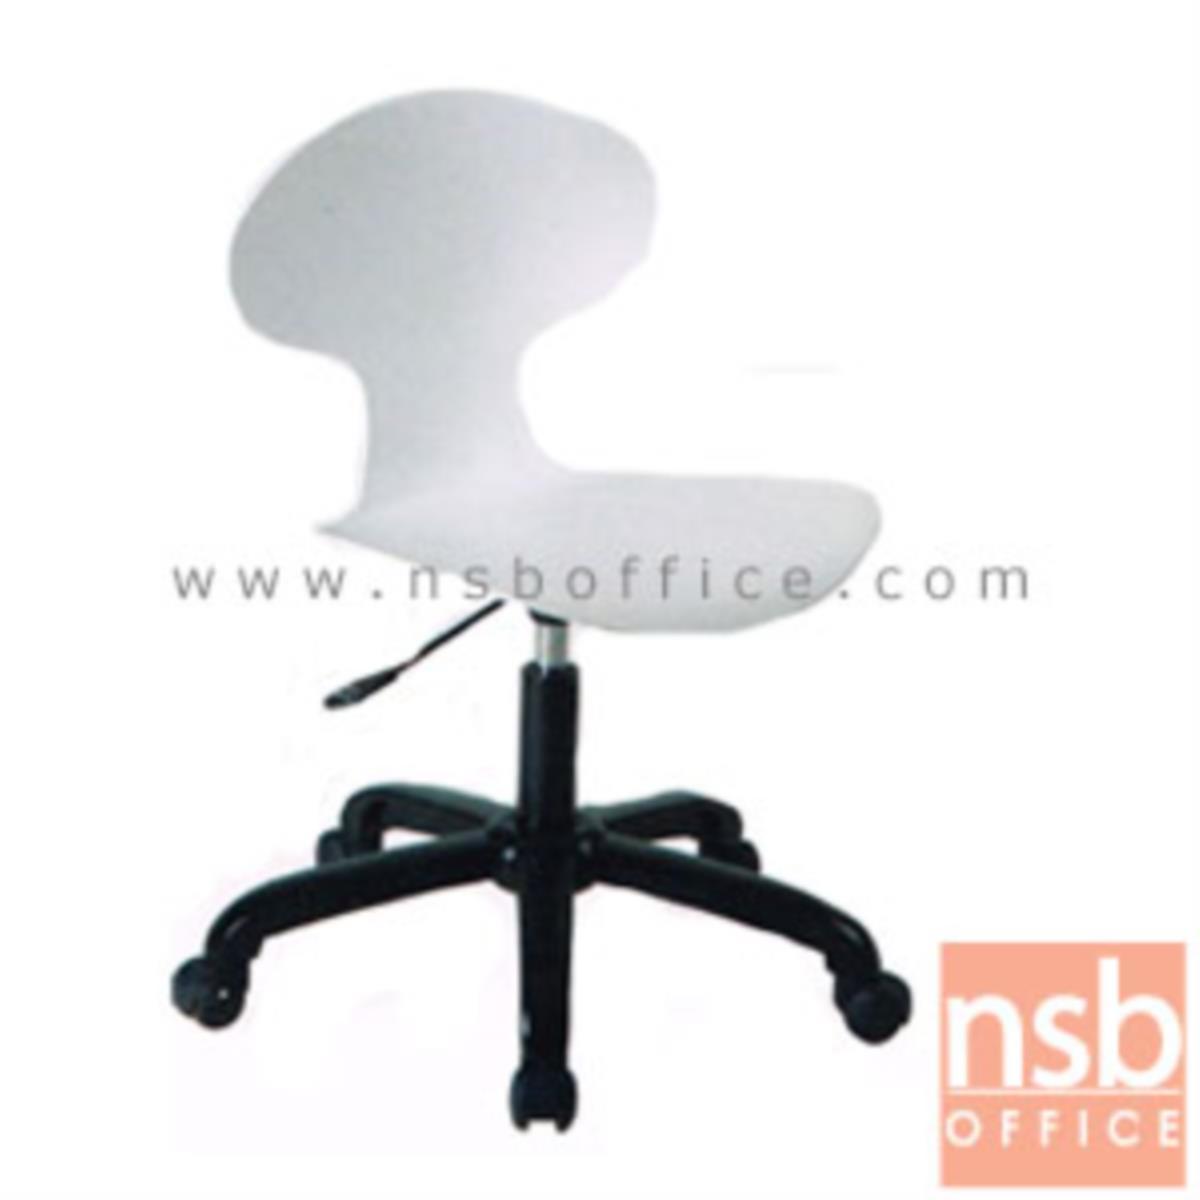 B24A164:เก้าอี้สำนักงานโพลี่ รุ่น Dominator (โดมิเนเตอร์)  โช๊คแก๊ส ขาพลาสติก